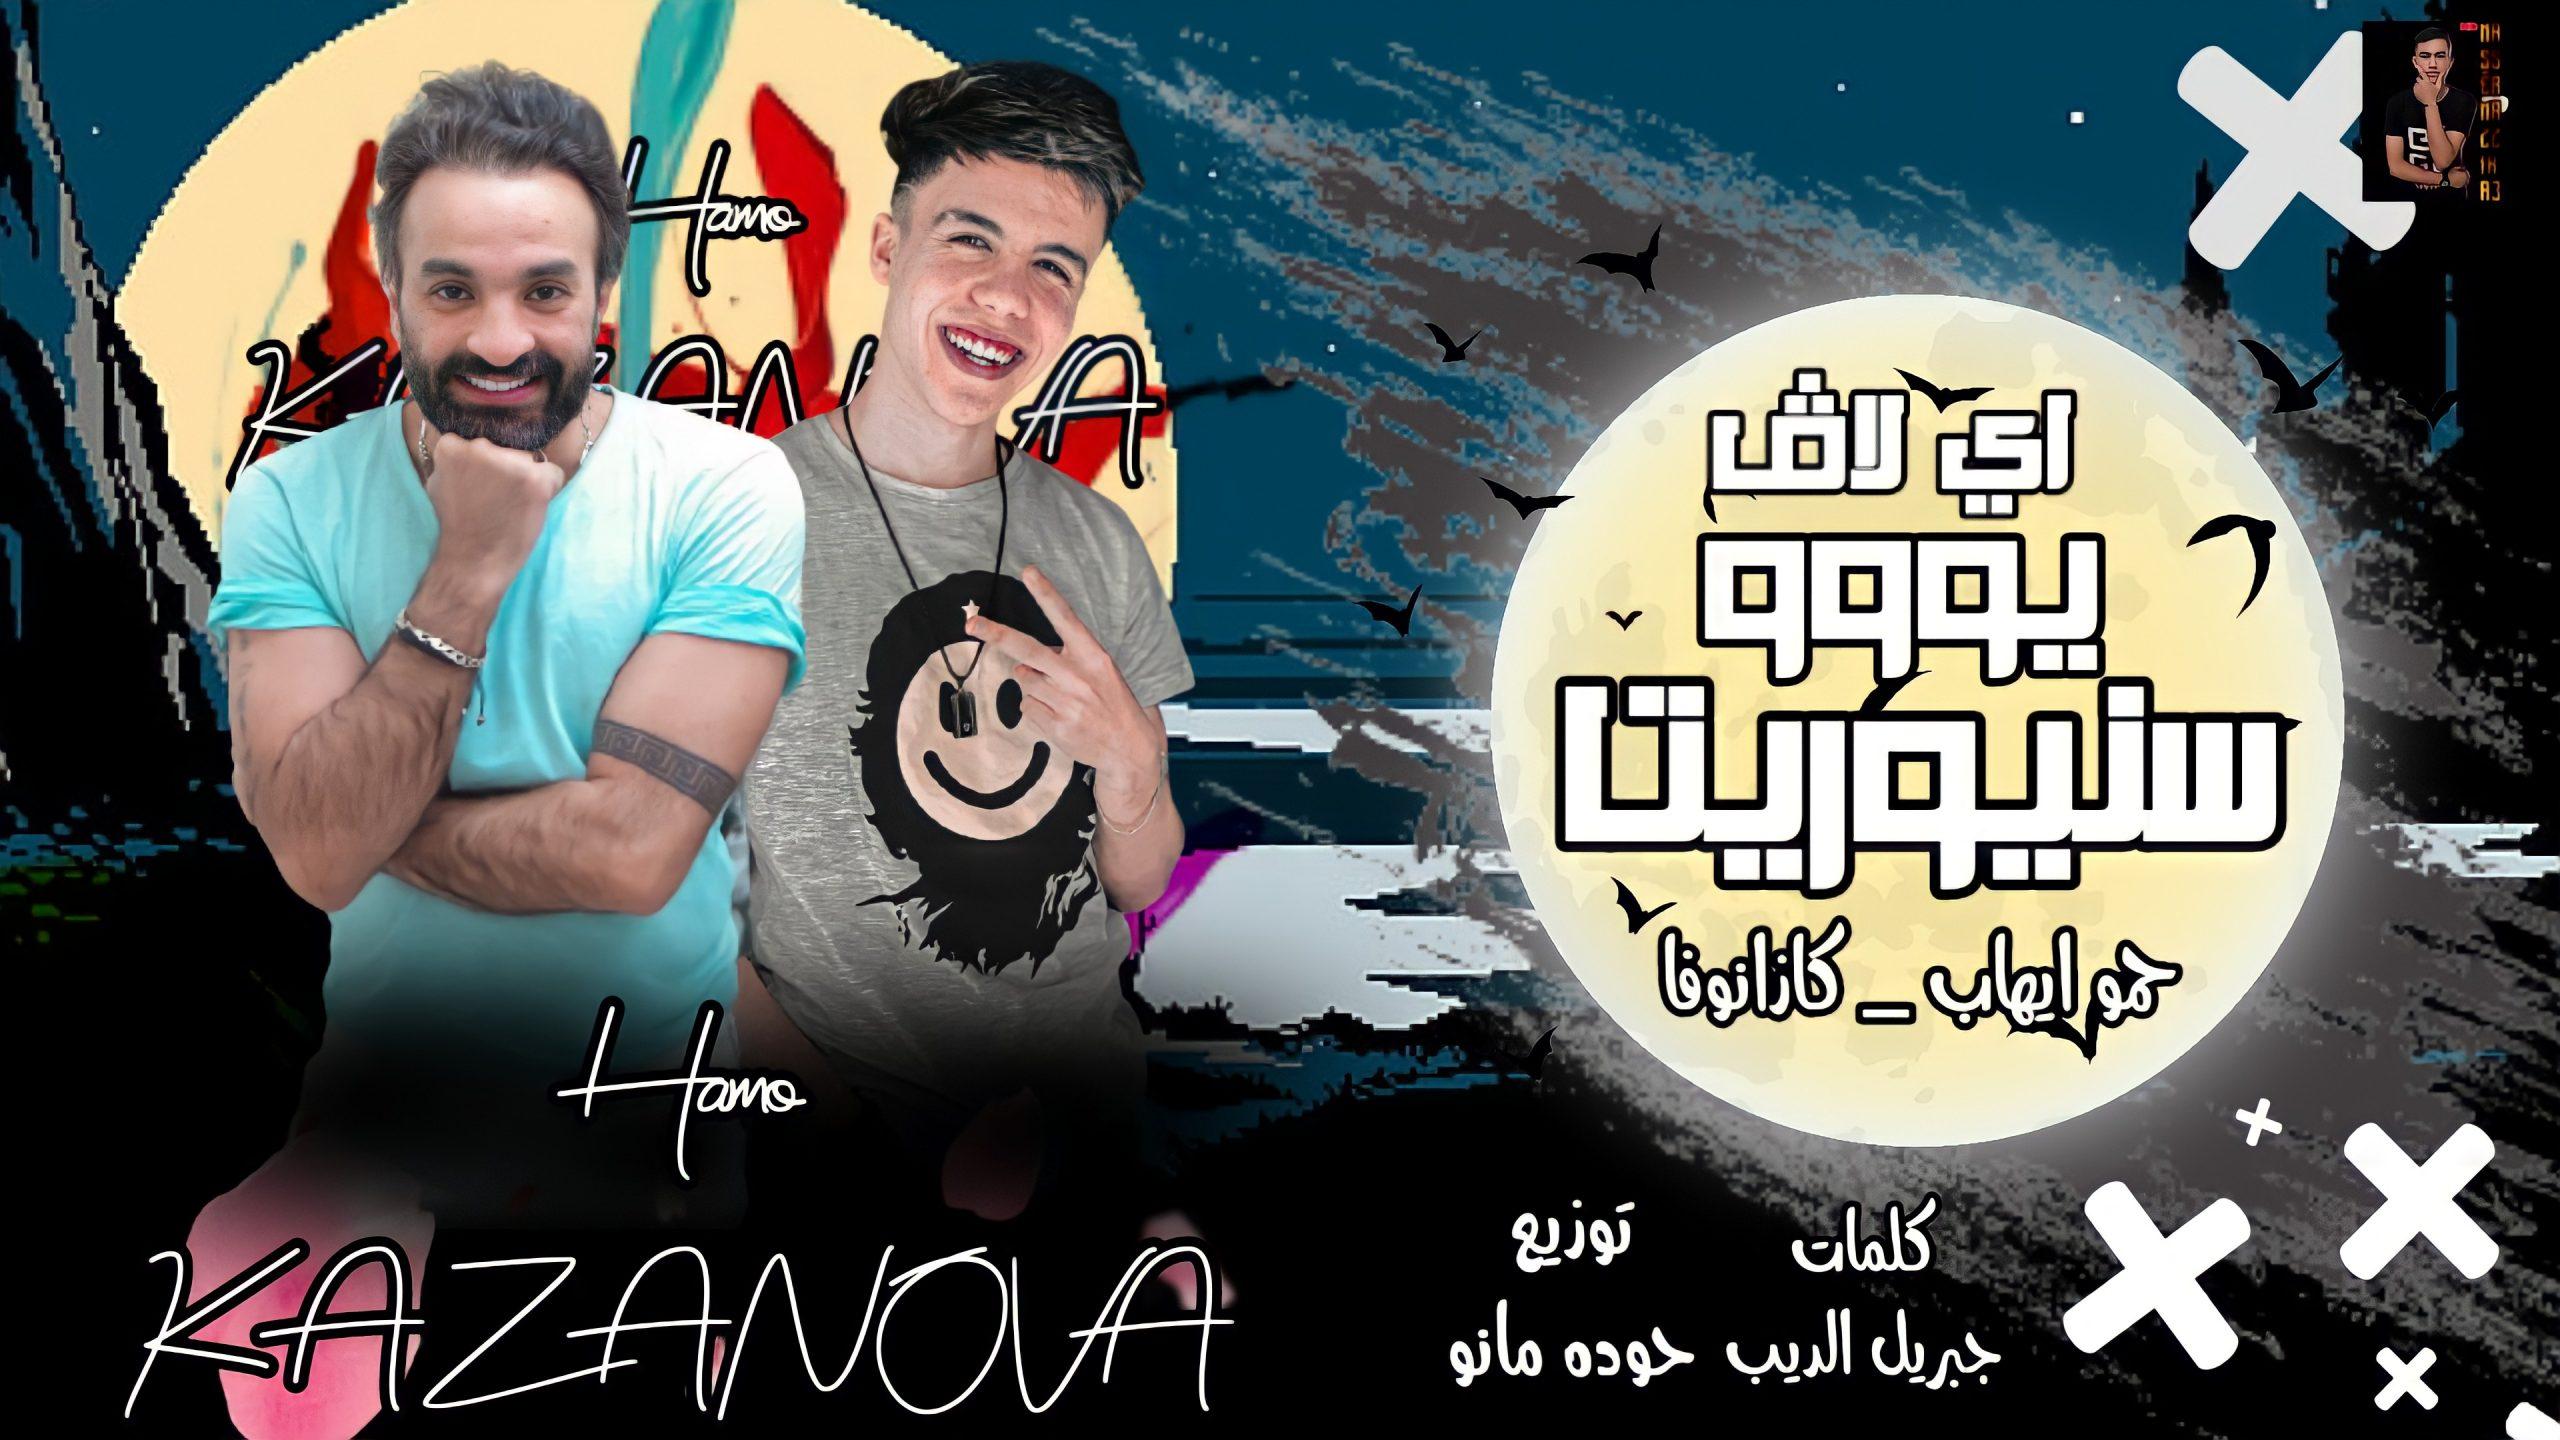 مهرجان اي لاف سينيوريتا - حمو ايهاب - كازانوفا - مانو - اجدد المهرجانات 2021